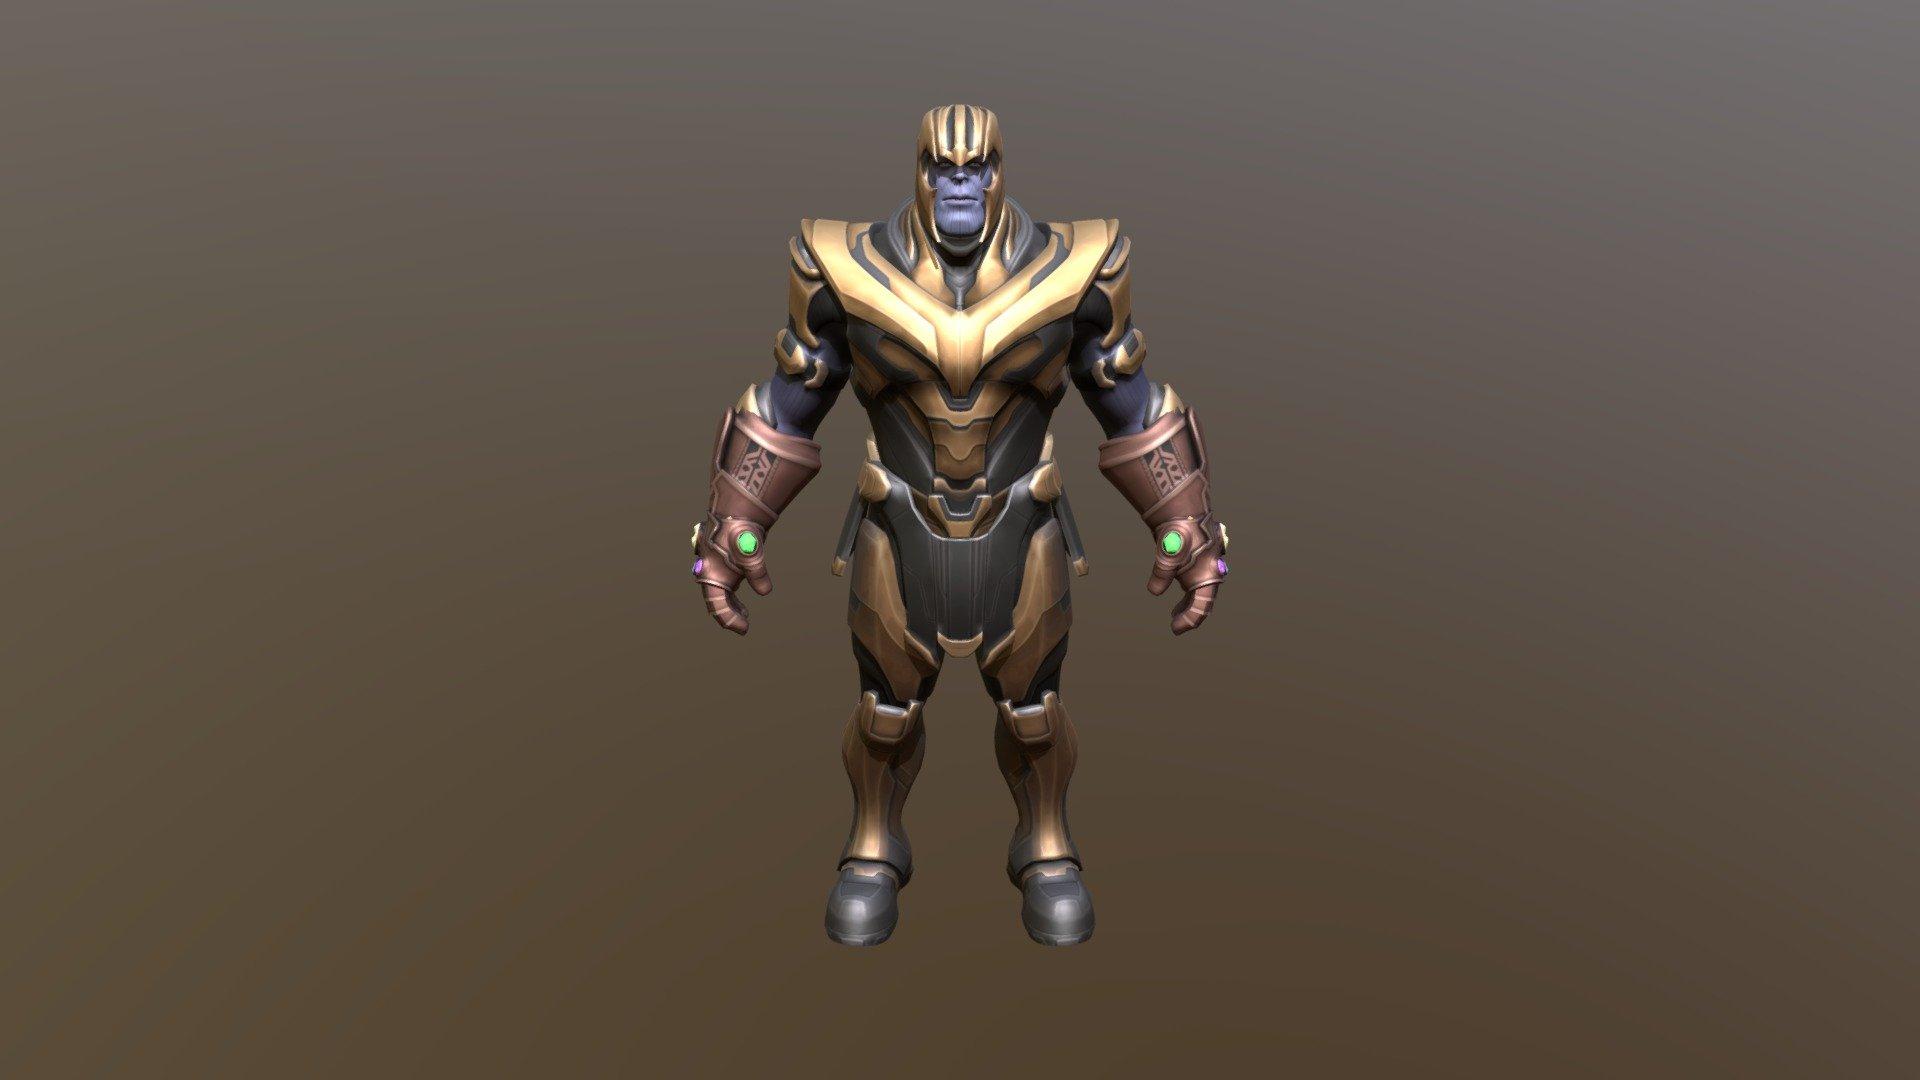 Fortnite Thanos Download Free 3d Model By Fortnite Re Uploaded Muhamedataman032 1ad8e41 Sketchfab